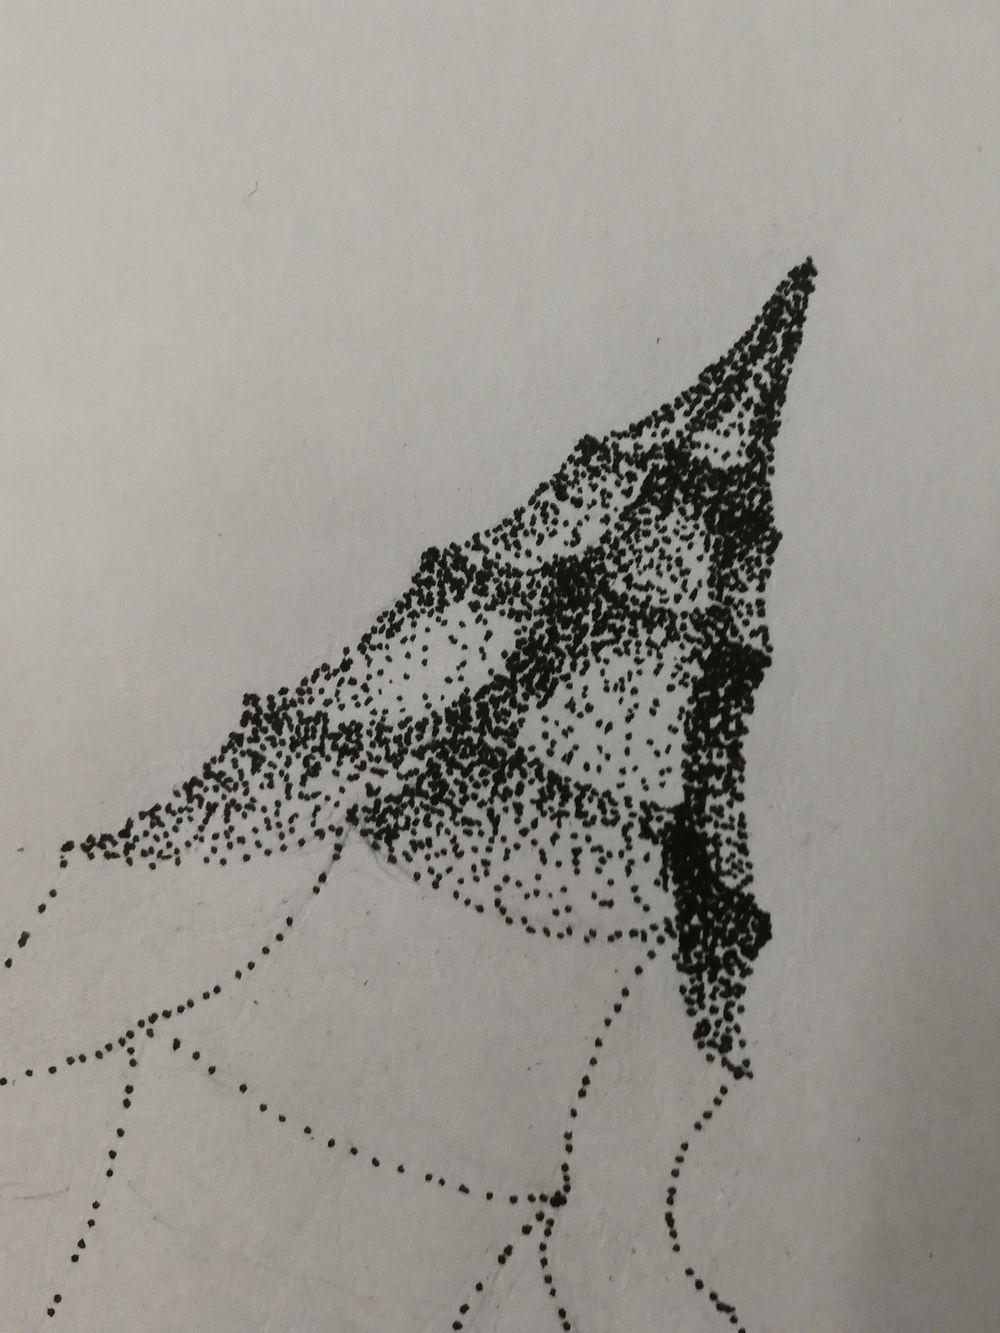 Seashell - image 1 - student project